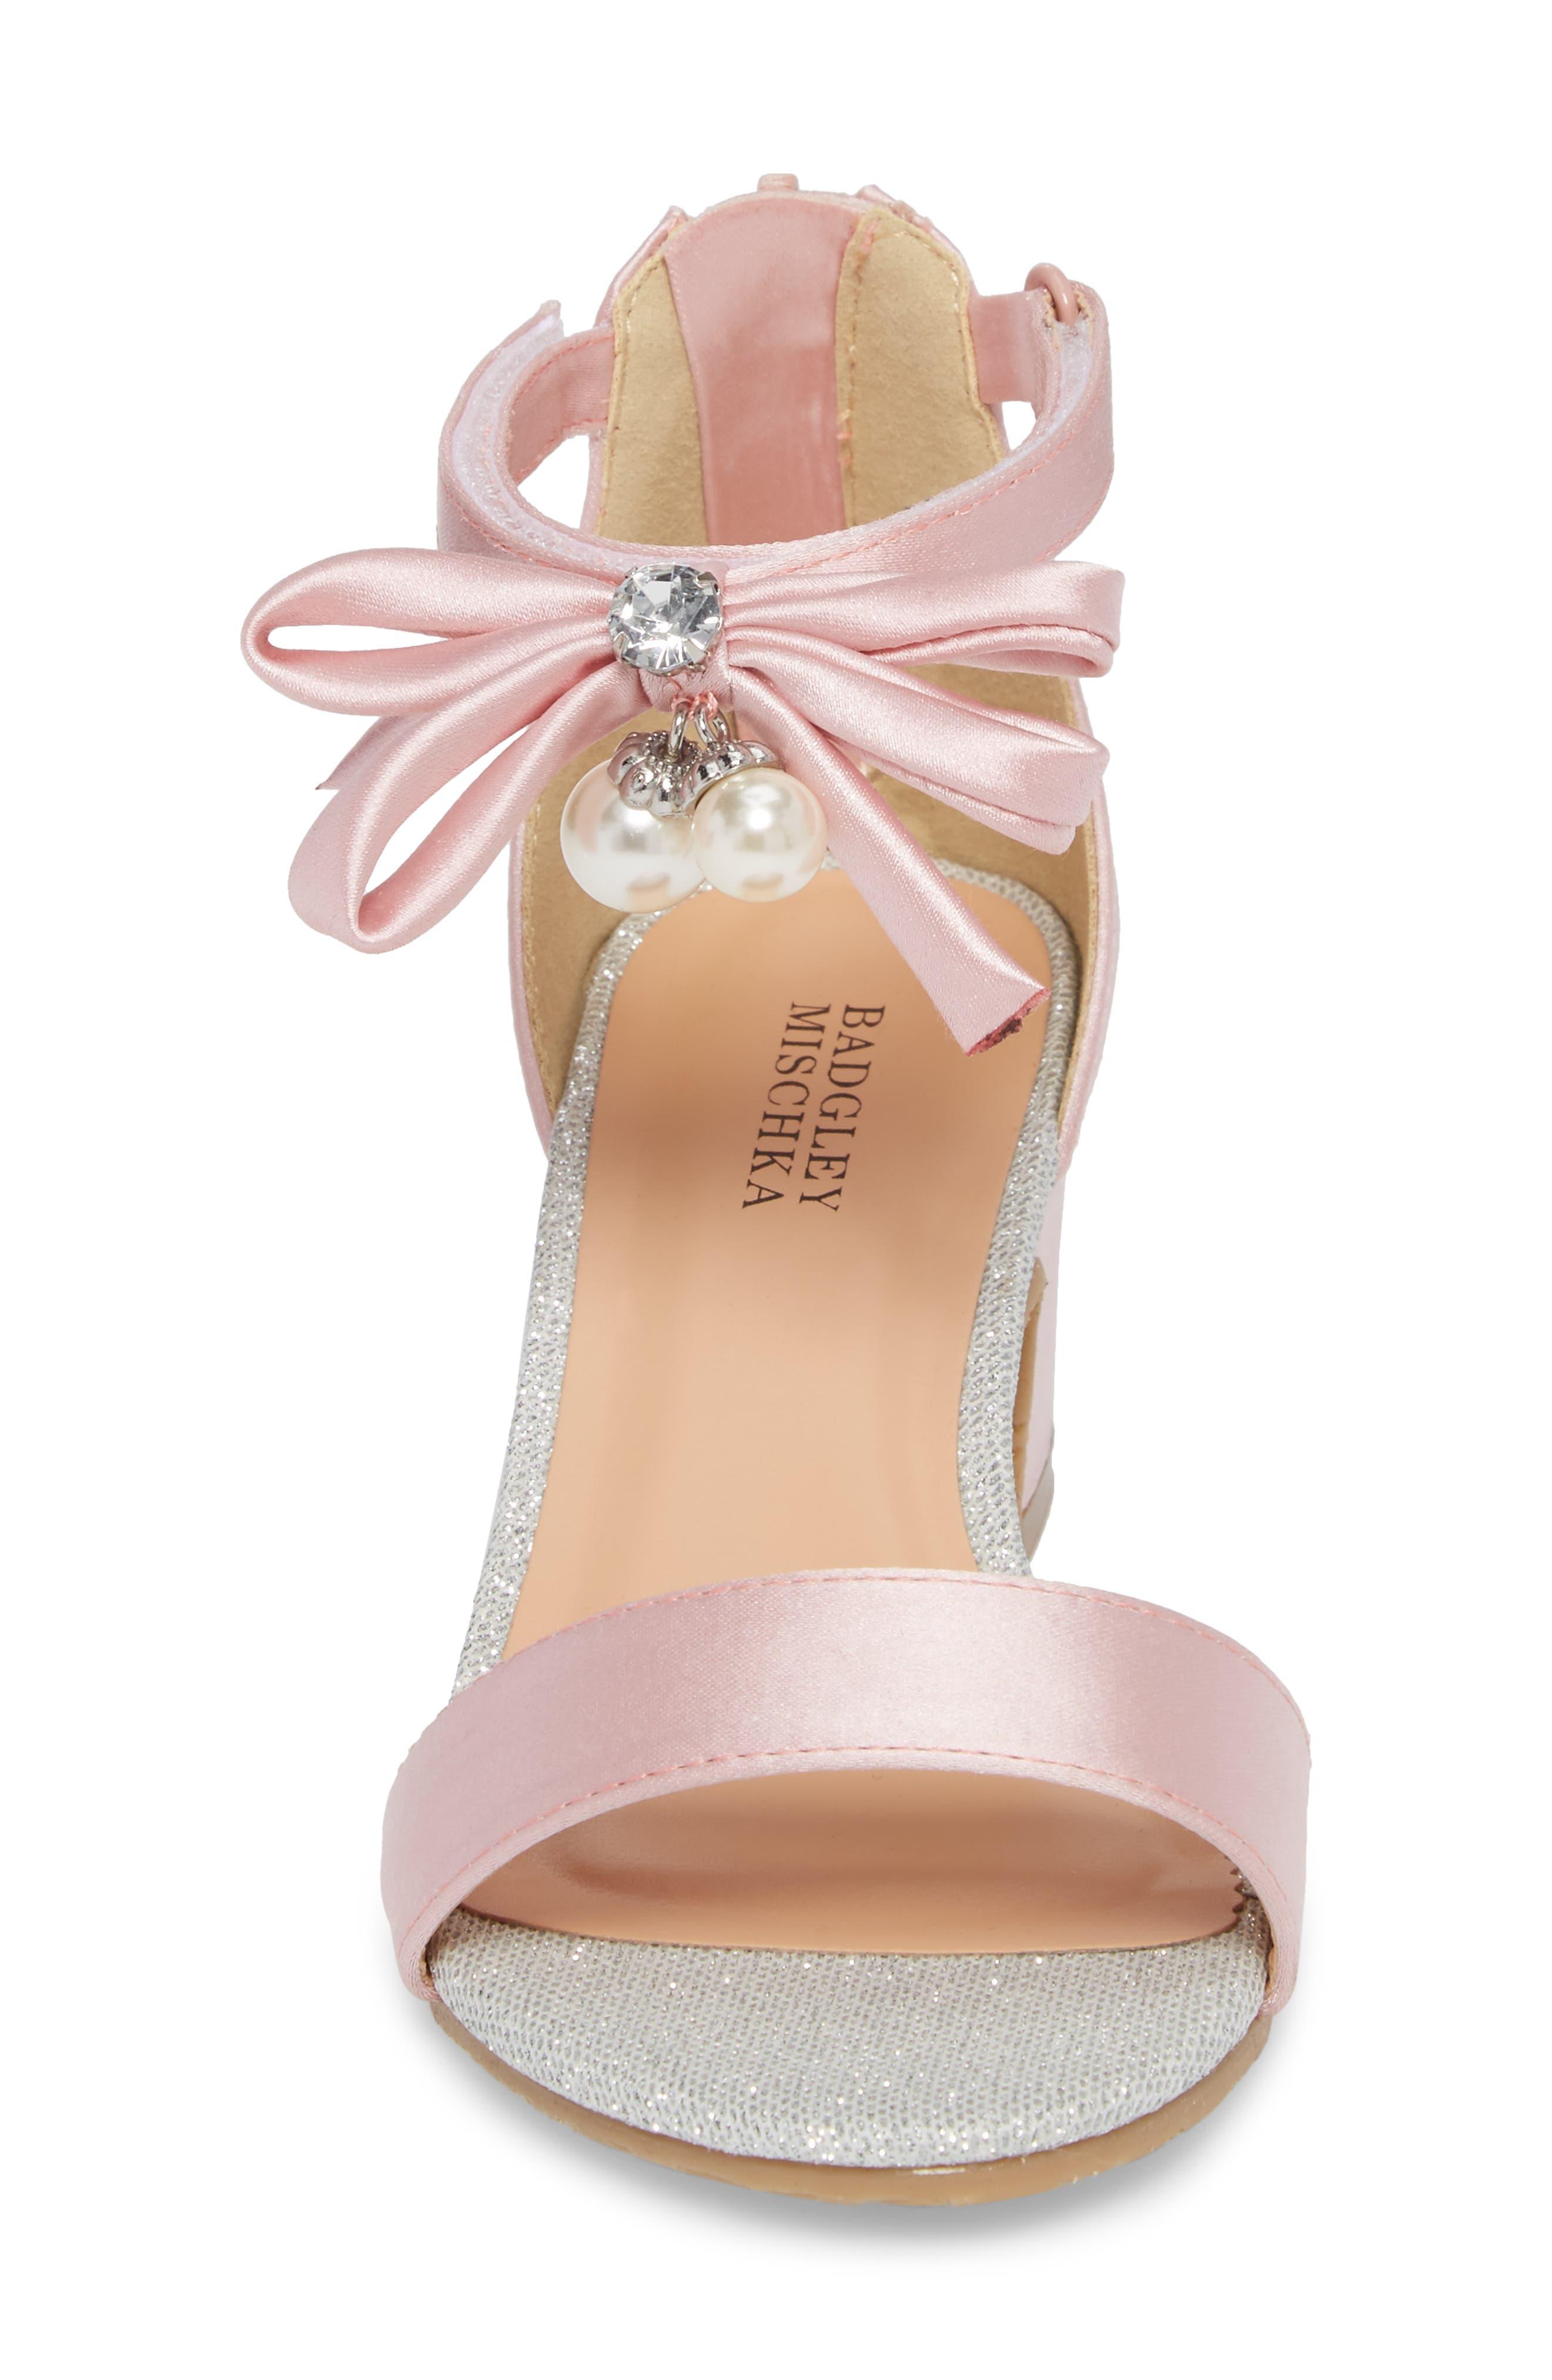 BADGLEY MISCHKA COLLECTION, Badgley Mischka Pernia Embellished Sandal, Alternate thumbnail 4, color, PINK/ SILVER